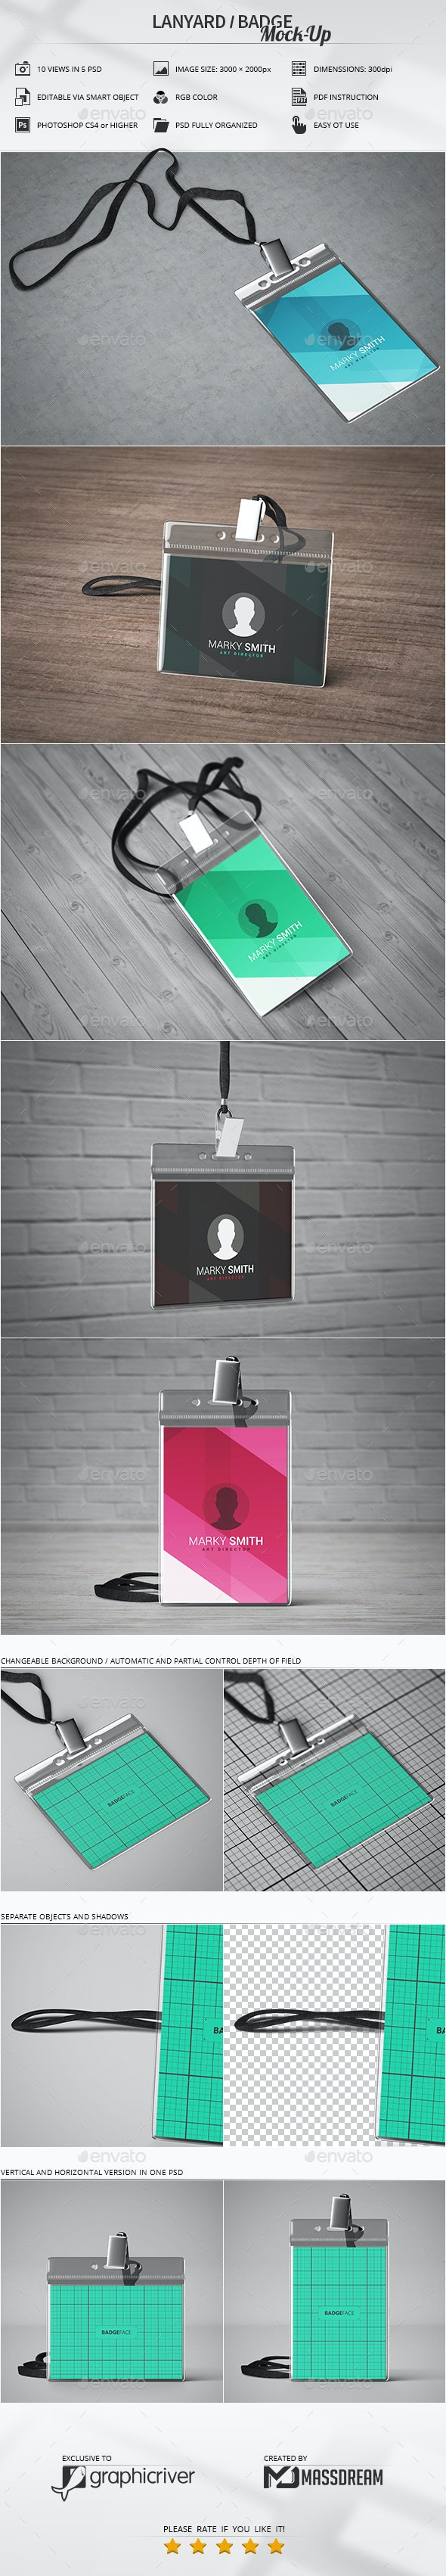 Lanyard / Badge Mock-Up - Product Mock-Ups Graphics